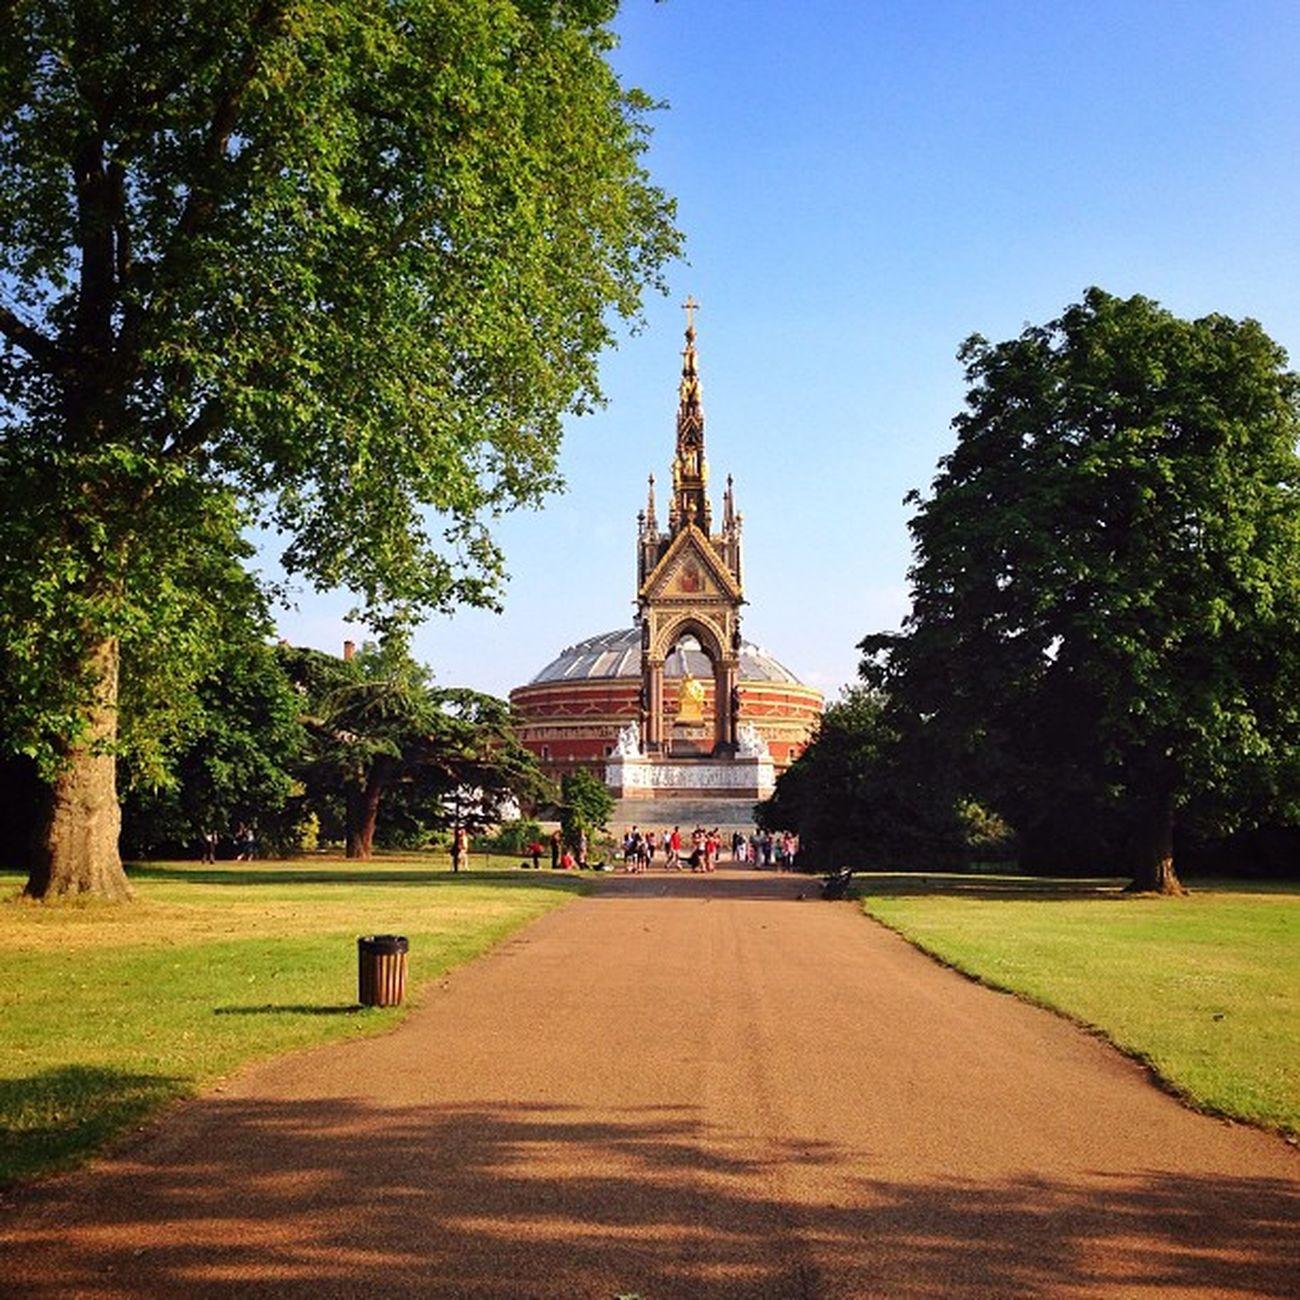 Albert Memorial and Royal Albert Hall from #kensington_gardens ☀️???☀️??#alan_in_london #gf_uk #gang_family #igers_london #insta_london #london_only #thisislondon #ic_cities #ic_cities_london #ig_england #love_london #gi_uk #ig_london #londonpop #allsho Alan_in_london Insta_london Thisislondon Gi_uk Igers_london Park Ig_england Albert Love_london Memorial Ic_cities_london Royal Ig_london Gang_family Aauk Kensington Londonpop Yourturnbritain Allshots_ Kensington_gardens London_only Ic_cities Gf_uk